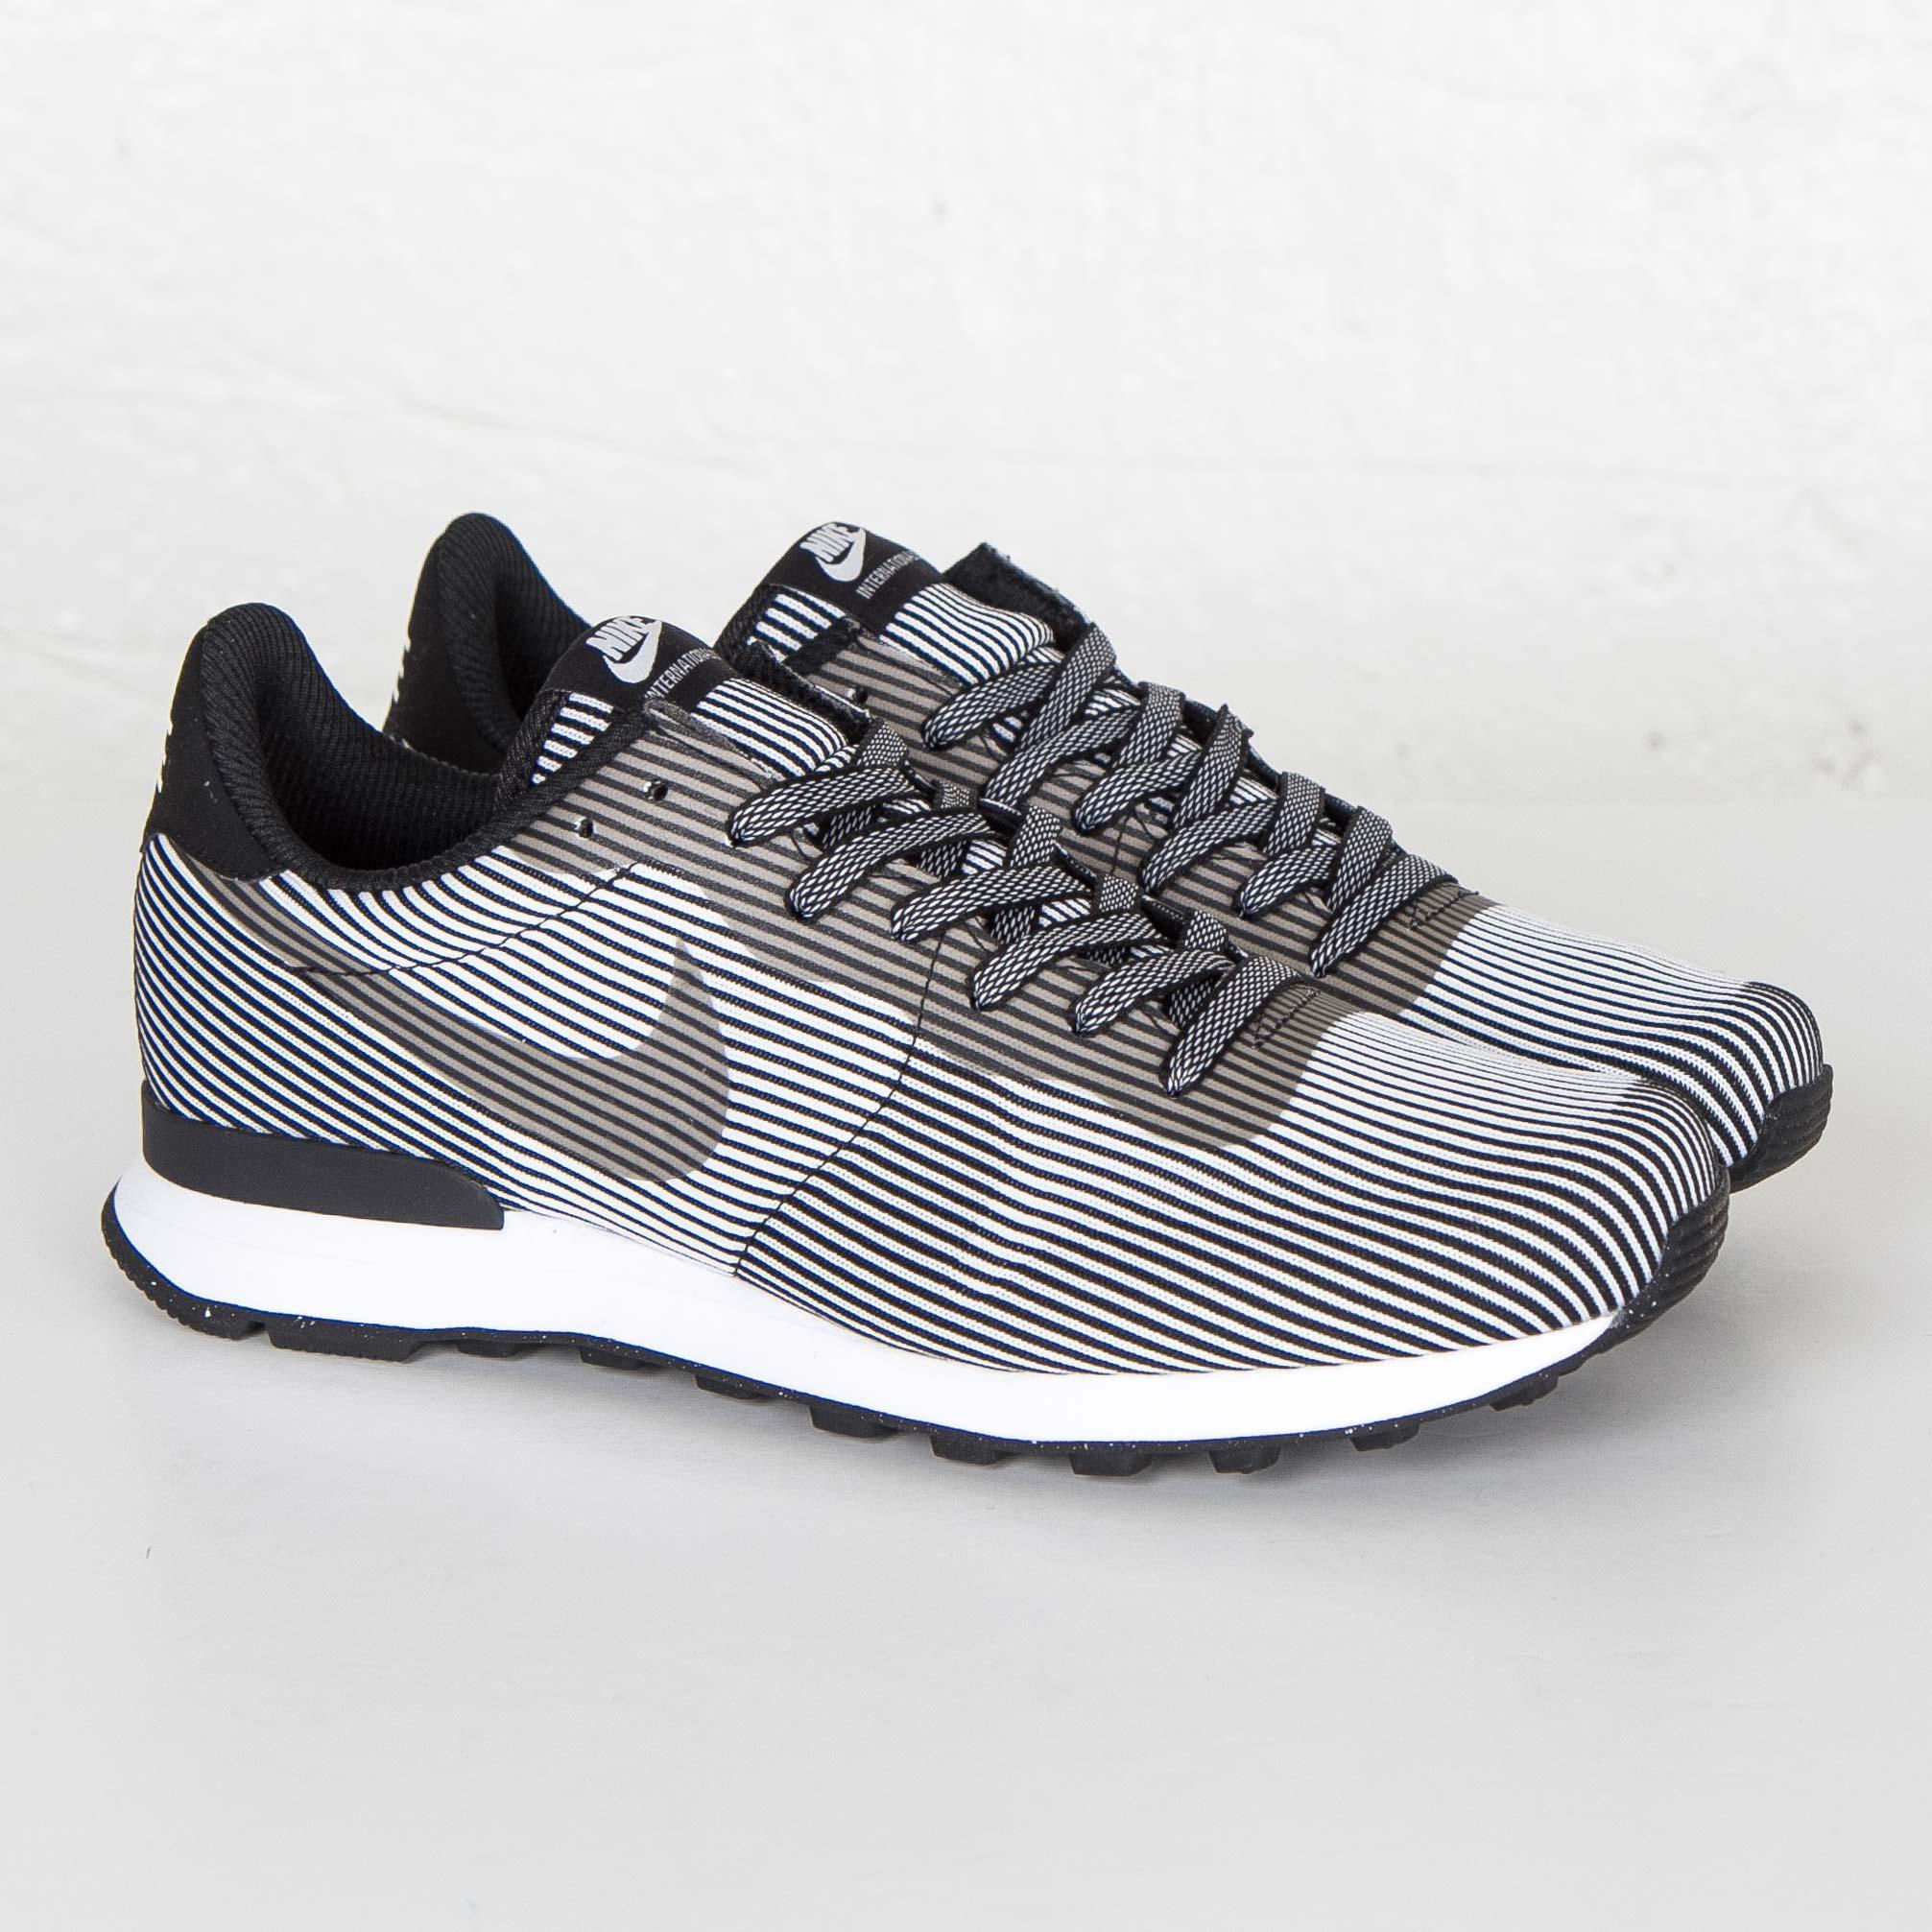 info for be1de 93568 Nike Internationalist Knit Jacquard